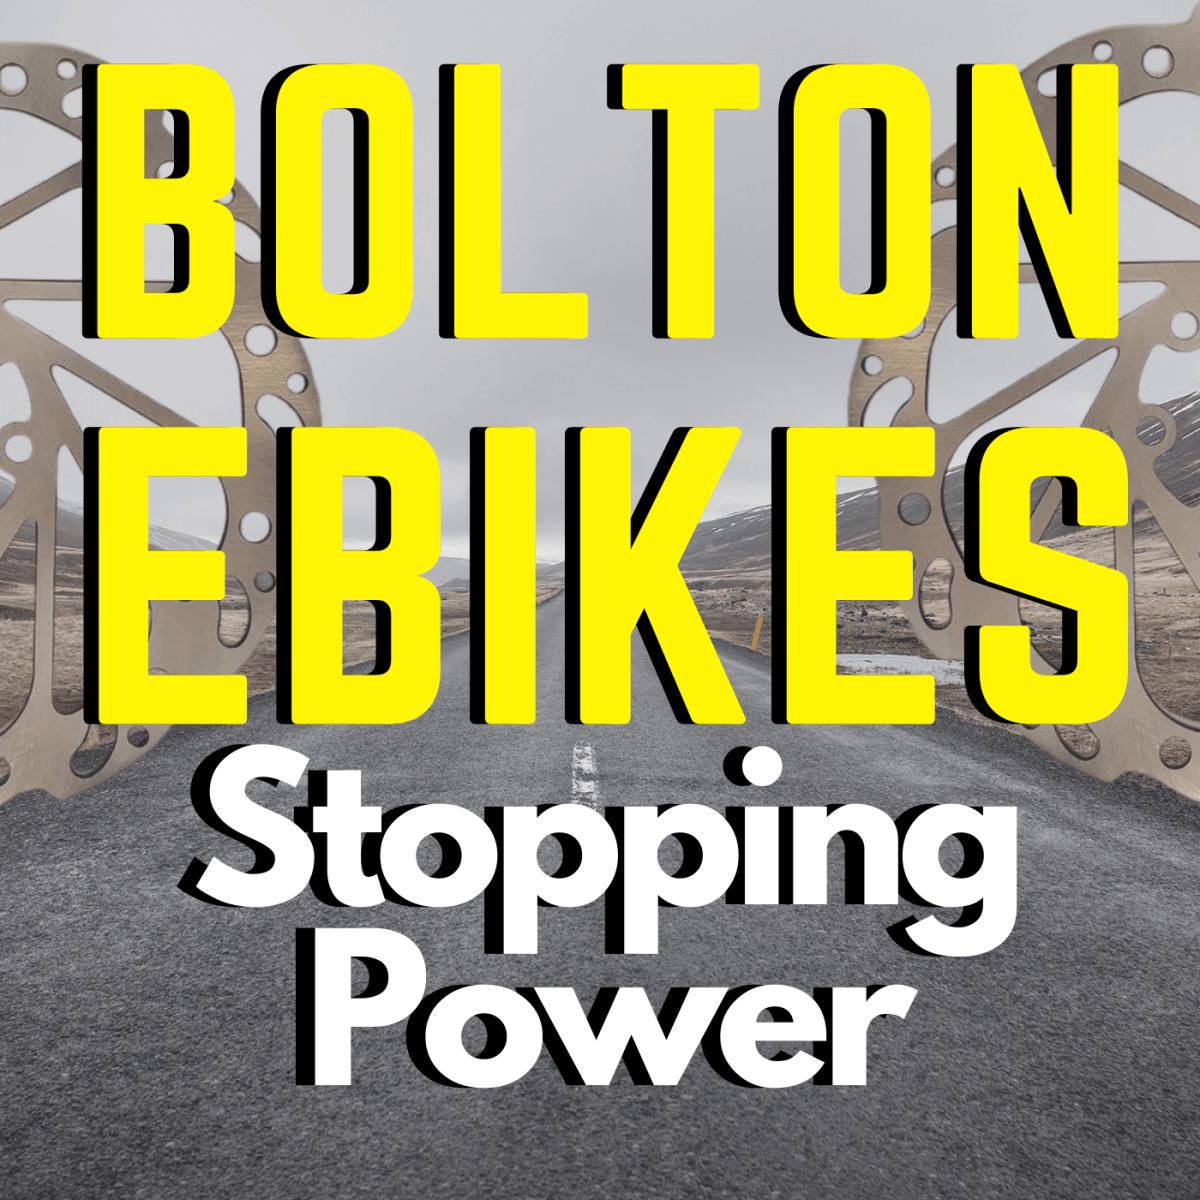 Ebike Brakes Explained